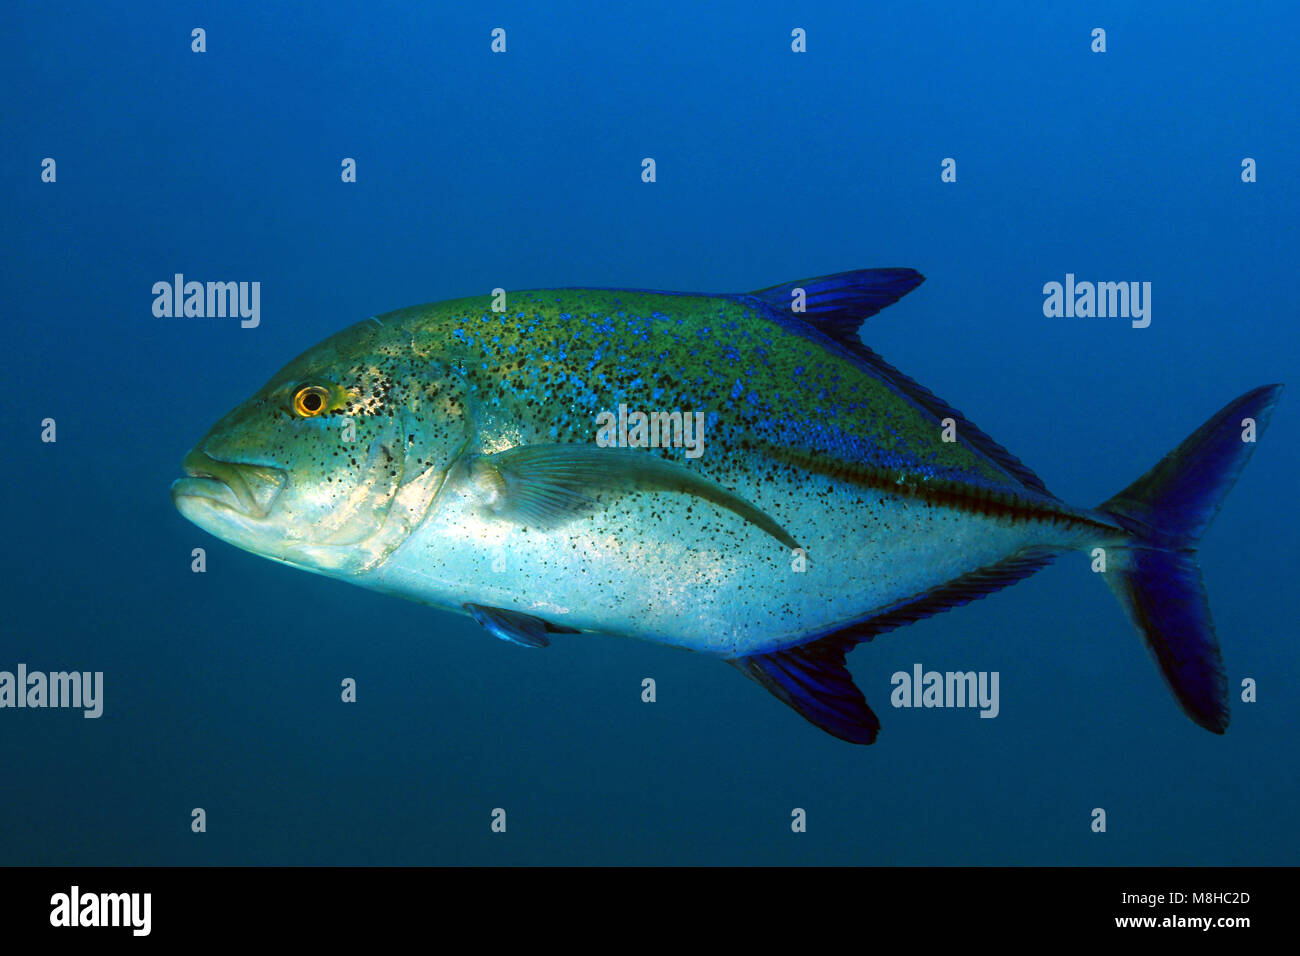 Bluefin Trevally (Caranx melampygus, aka Bluefin Jack). Coiba, Panama - Stock Image